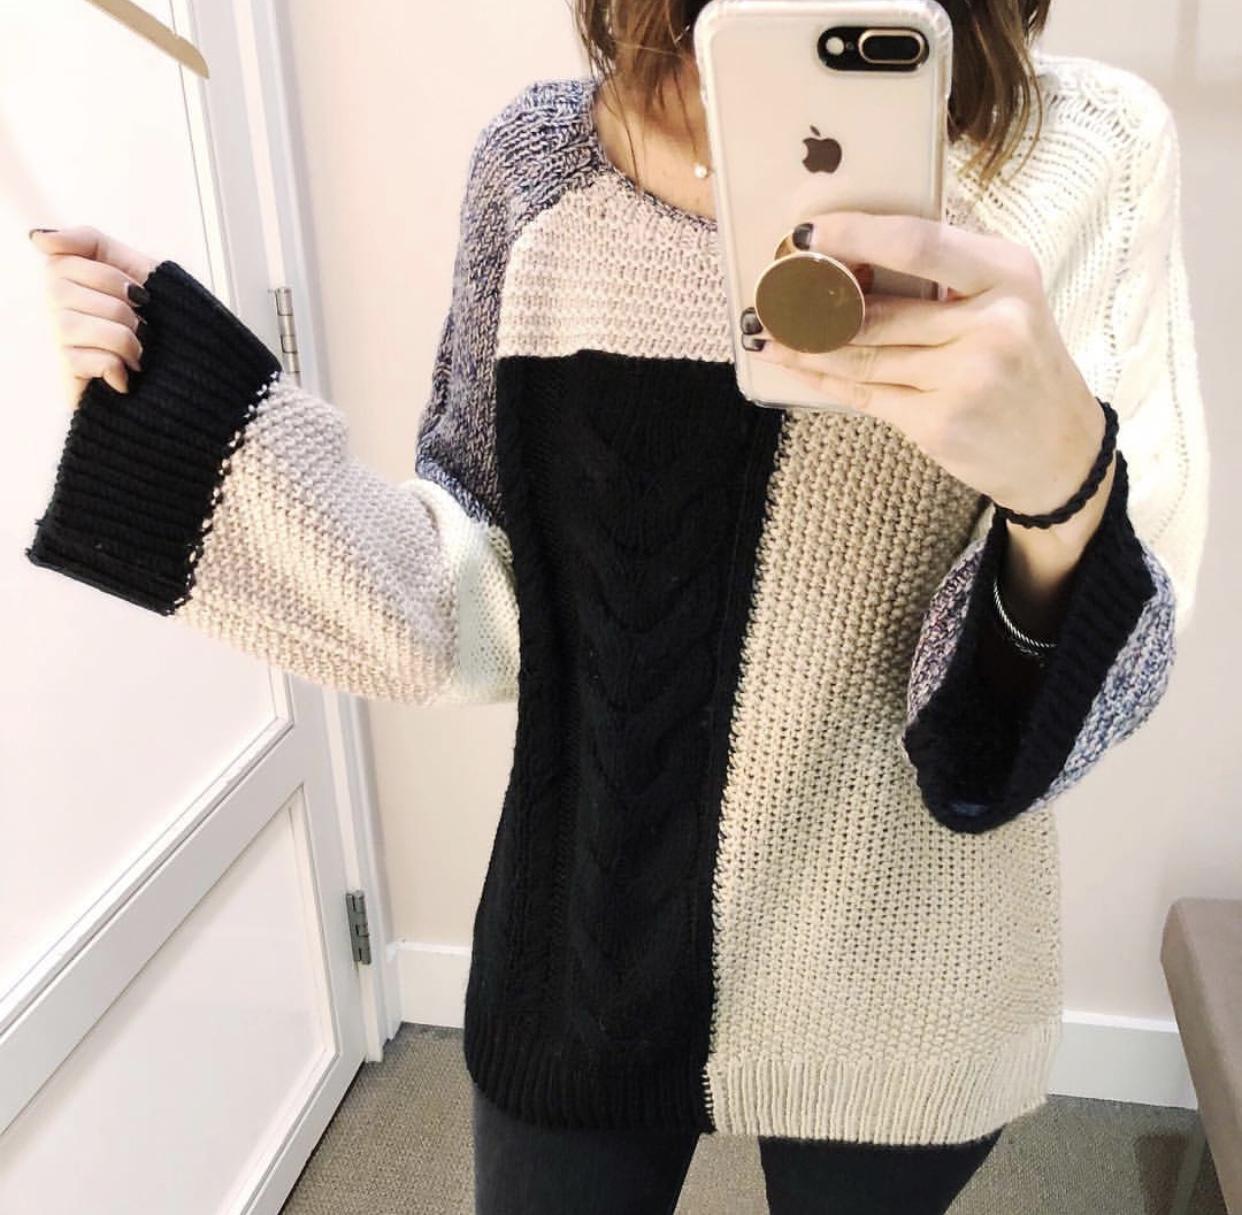 Colorblock Sweater - Instagram Fashion Lately by Washington DC fashion blogger Cobalt Chronicles